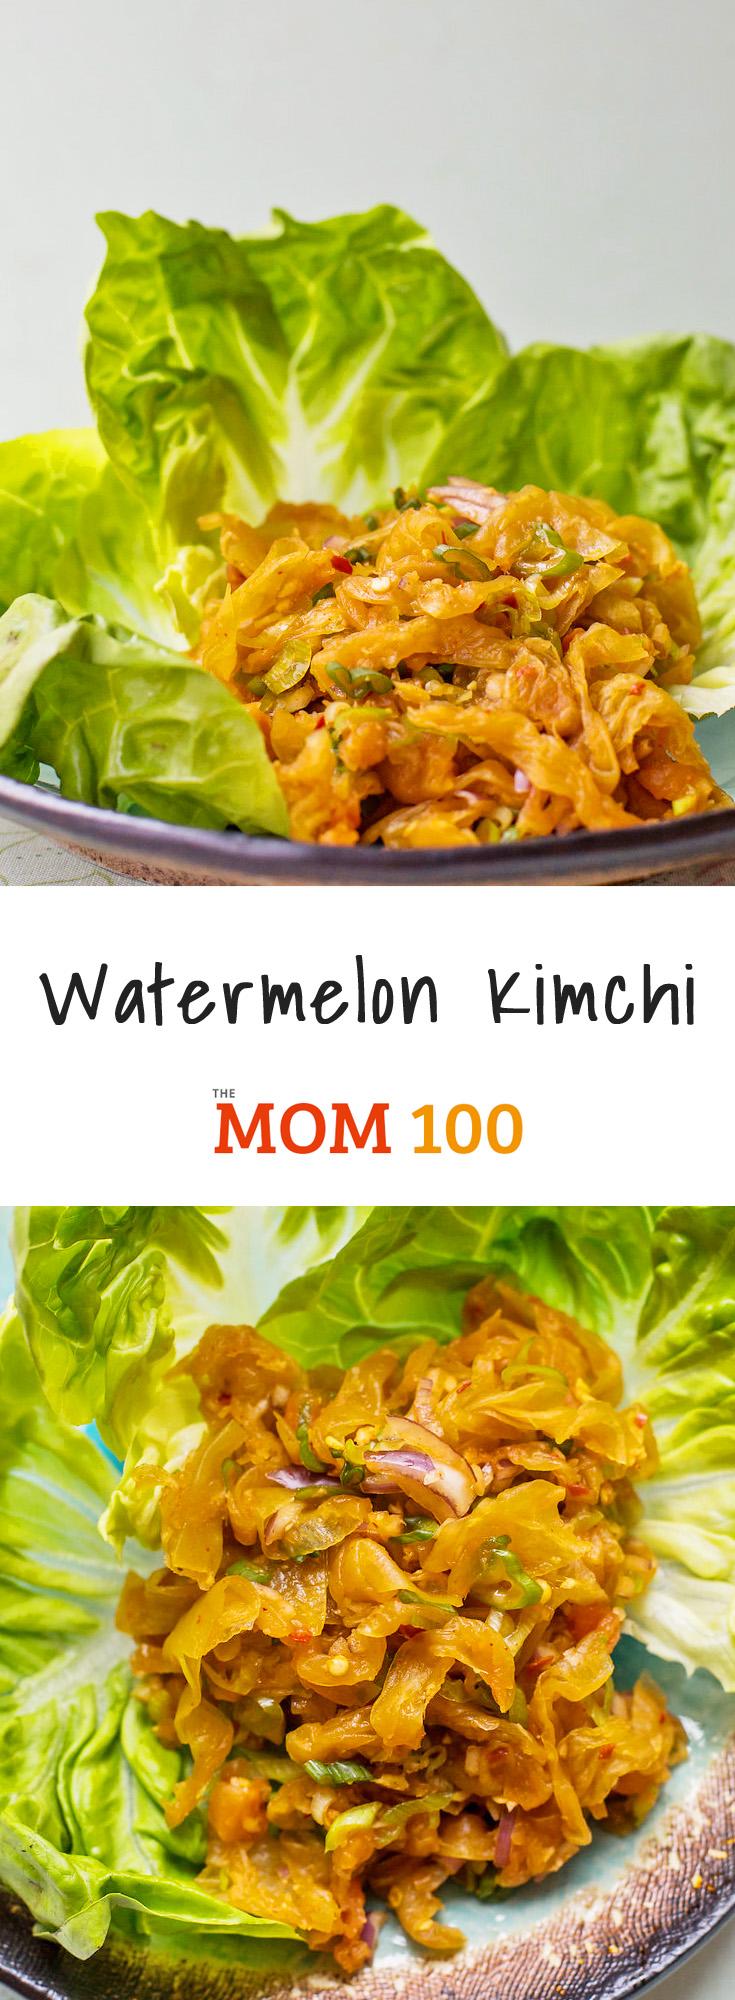 Watermelon Kimchi